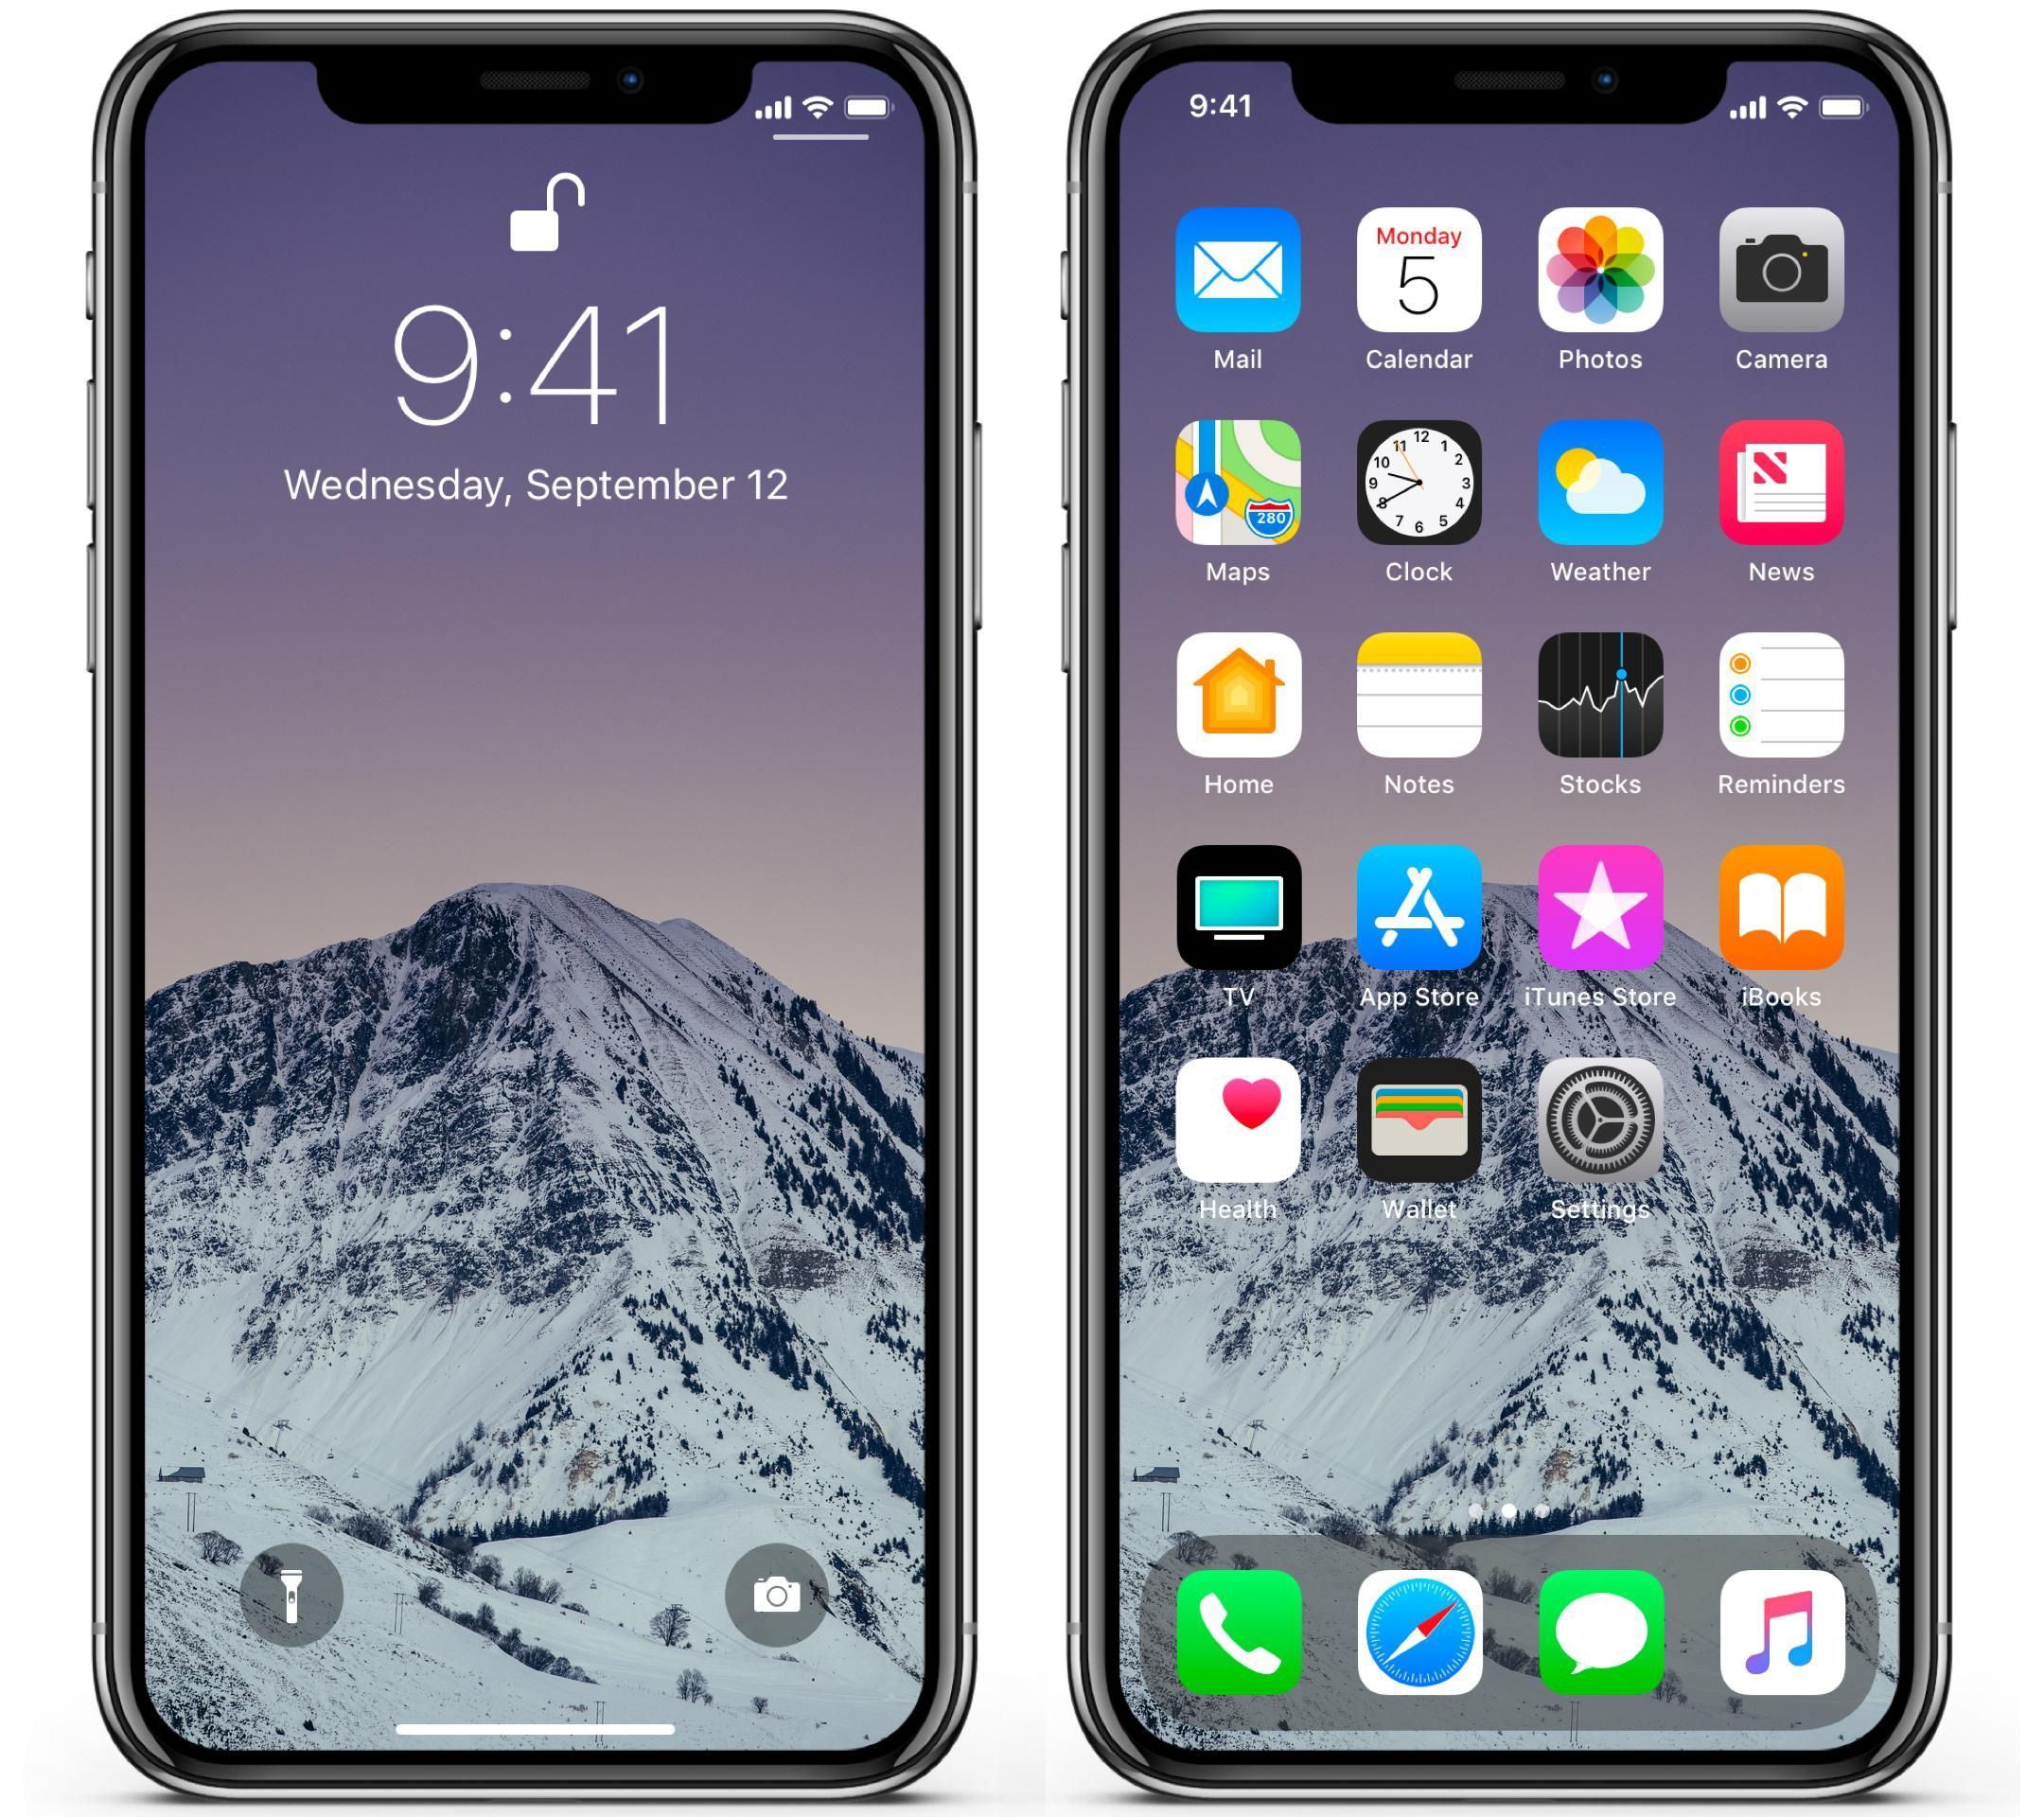 Wallpaper Day Peak Snow Snowy Mountain Twilight For Hd 4k Wallpaperday For Desktop Mobile Phones Free Download In 2020 Wallpaper Snowy Phone